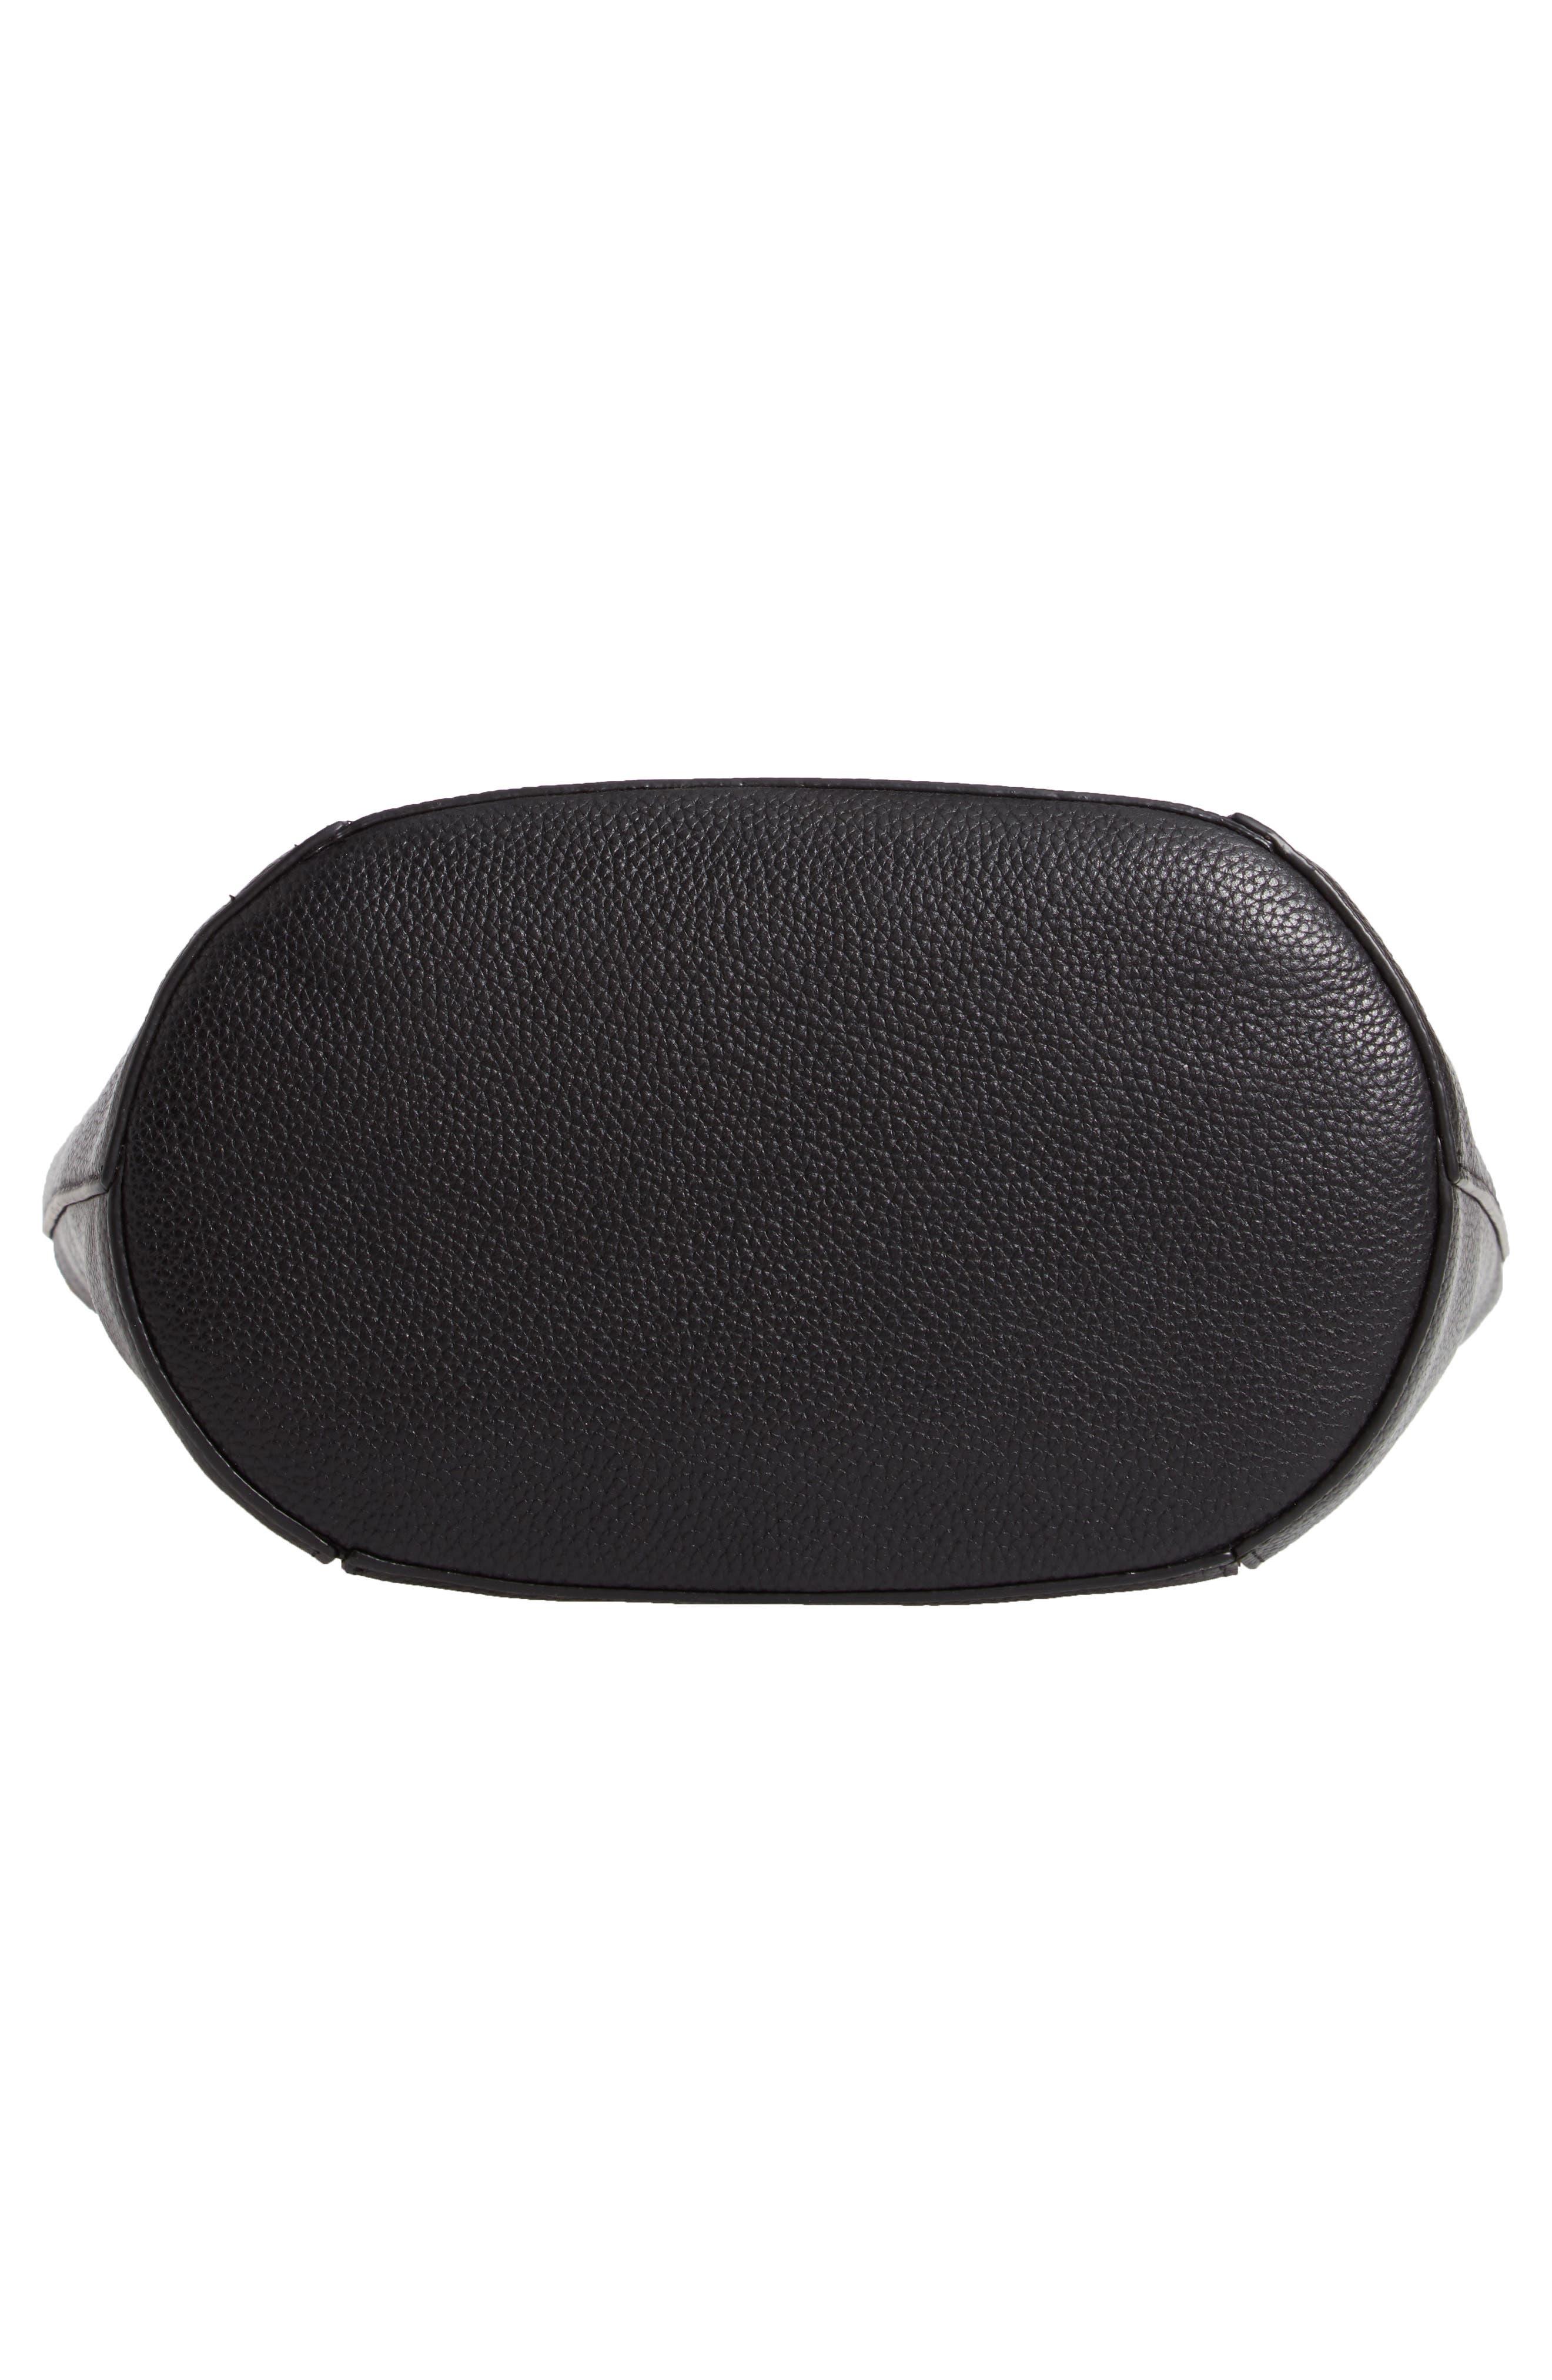 Loraine Leather Bucket Bag,                             Alternate thumbnail 6, color,                             BLACK